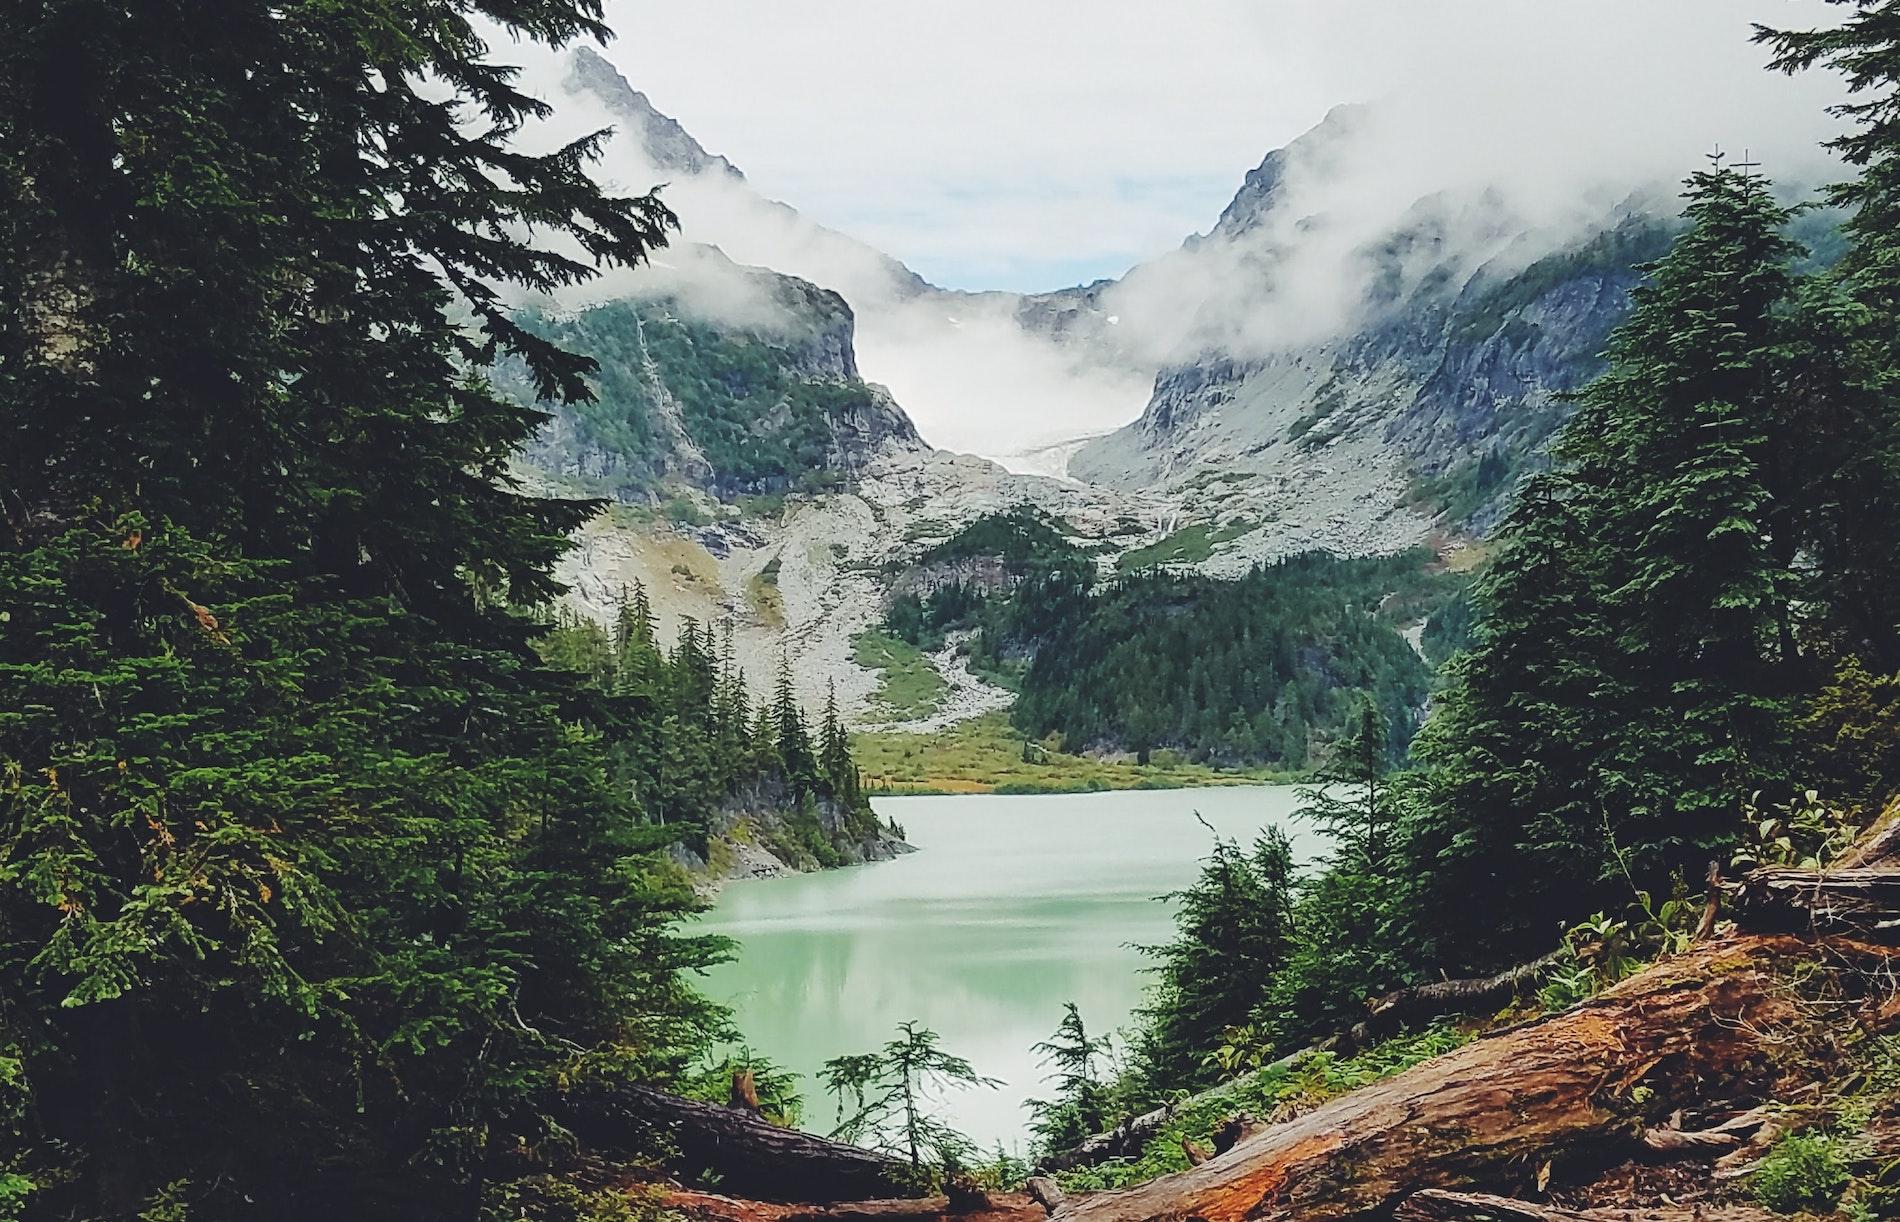 Blanca Lake Trailhead, United States